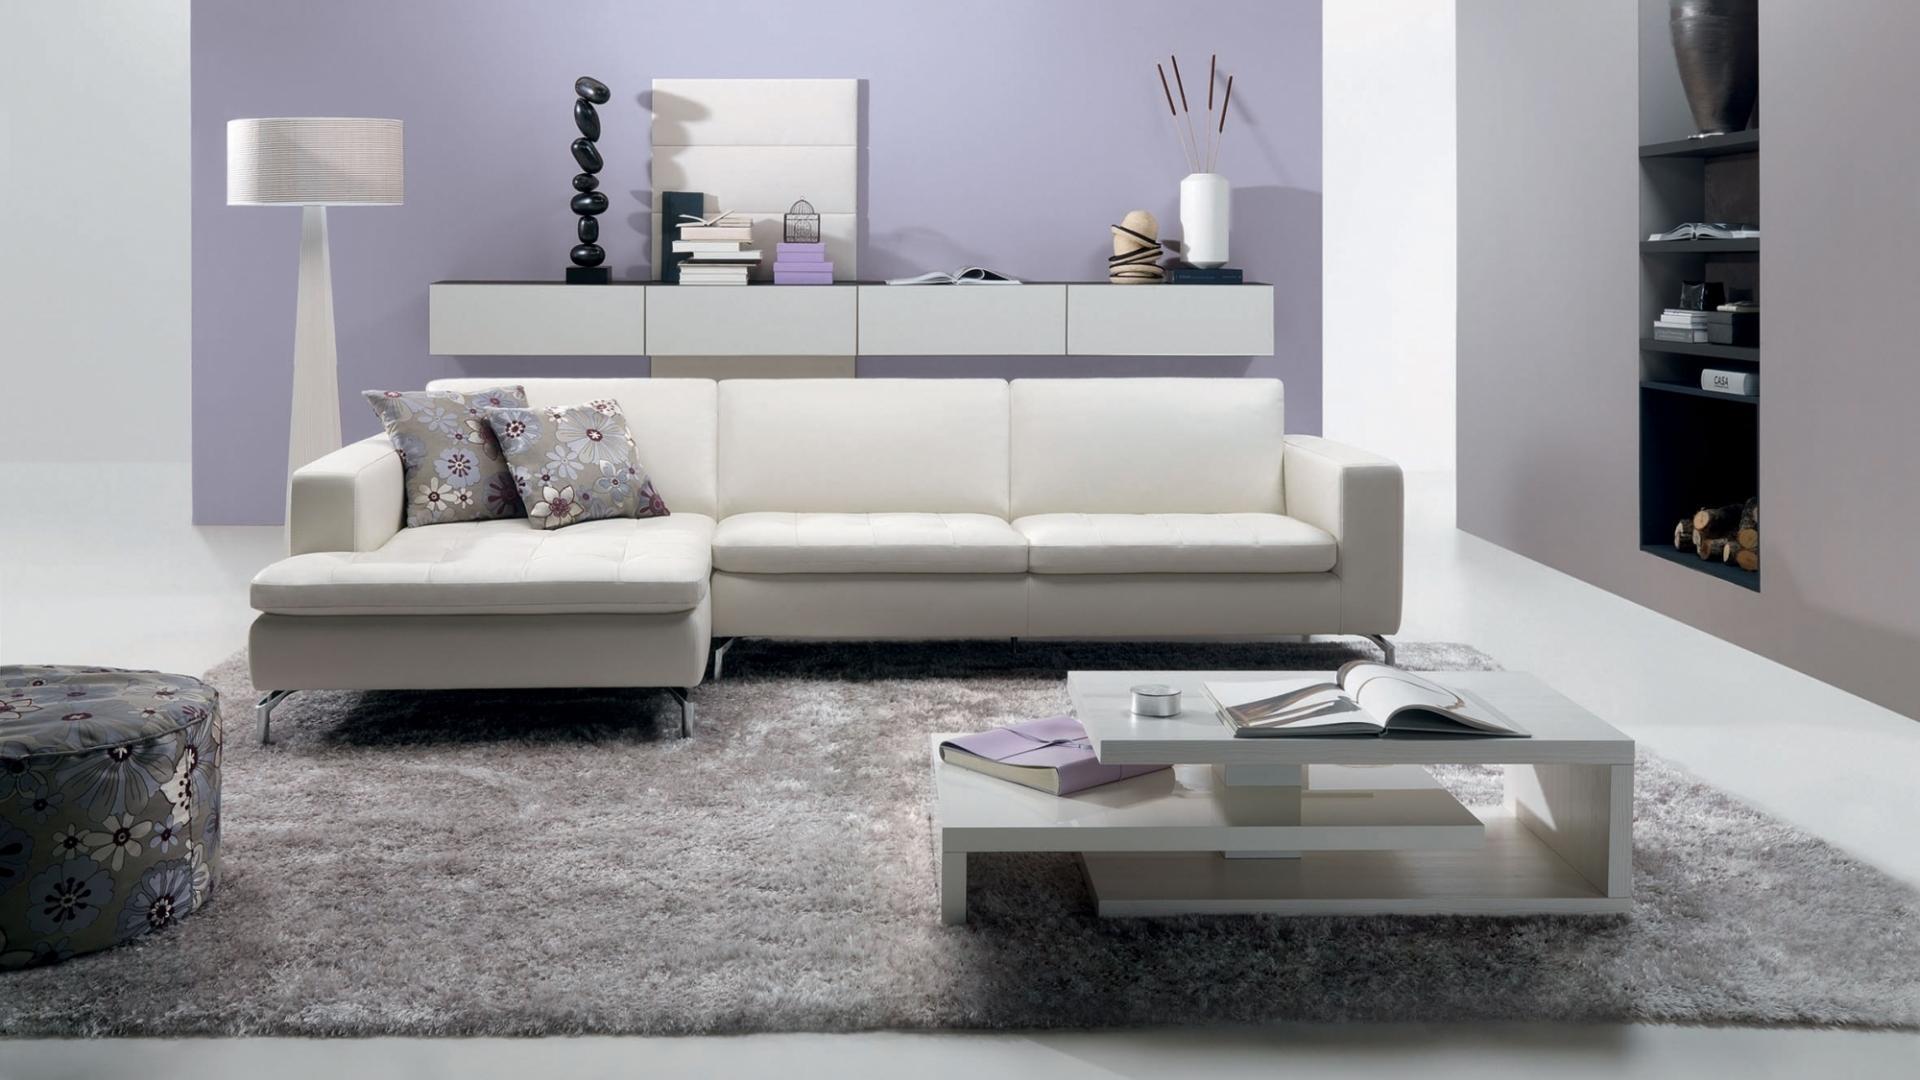 Savoy, Sofas, Fabric Leather | Natuzzi Inside Savoy Sofas (Image 19 of 20)